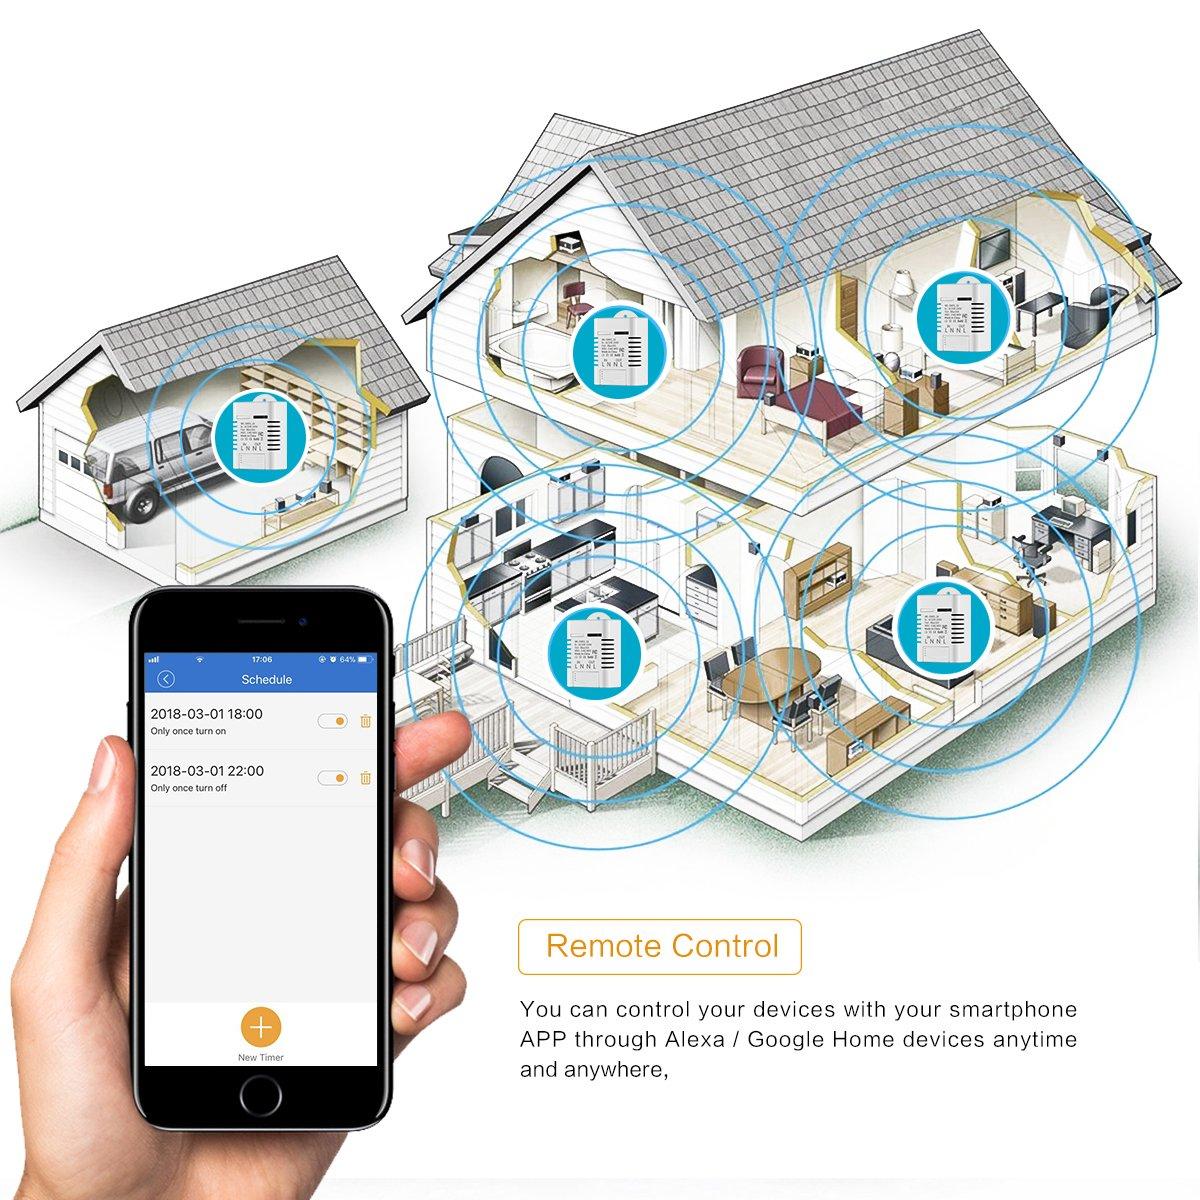 16A ONEVER Sans fil WiFi Smart Switch travail Module avec Alexa Google Accueil minuterie Control vocal distance pour Android IOS